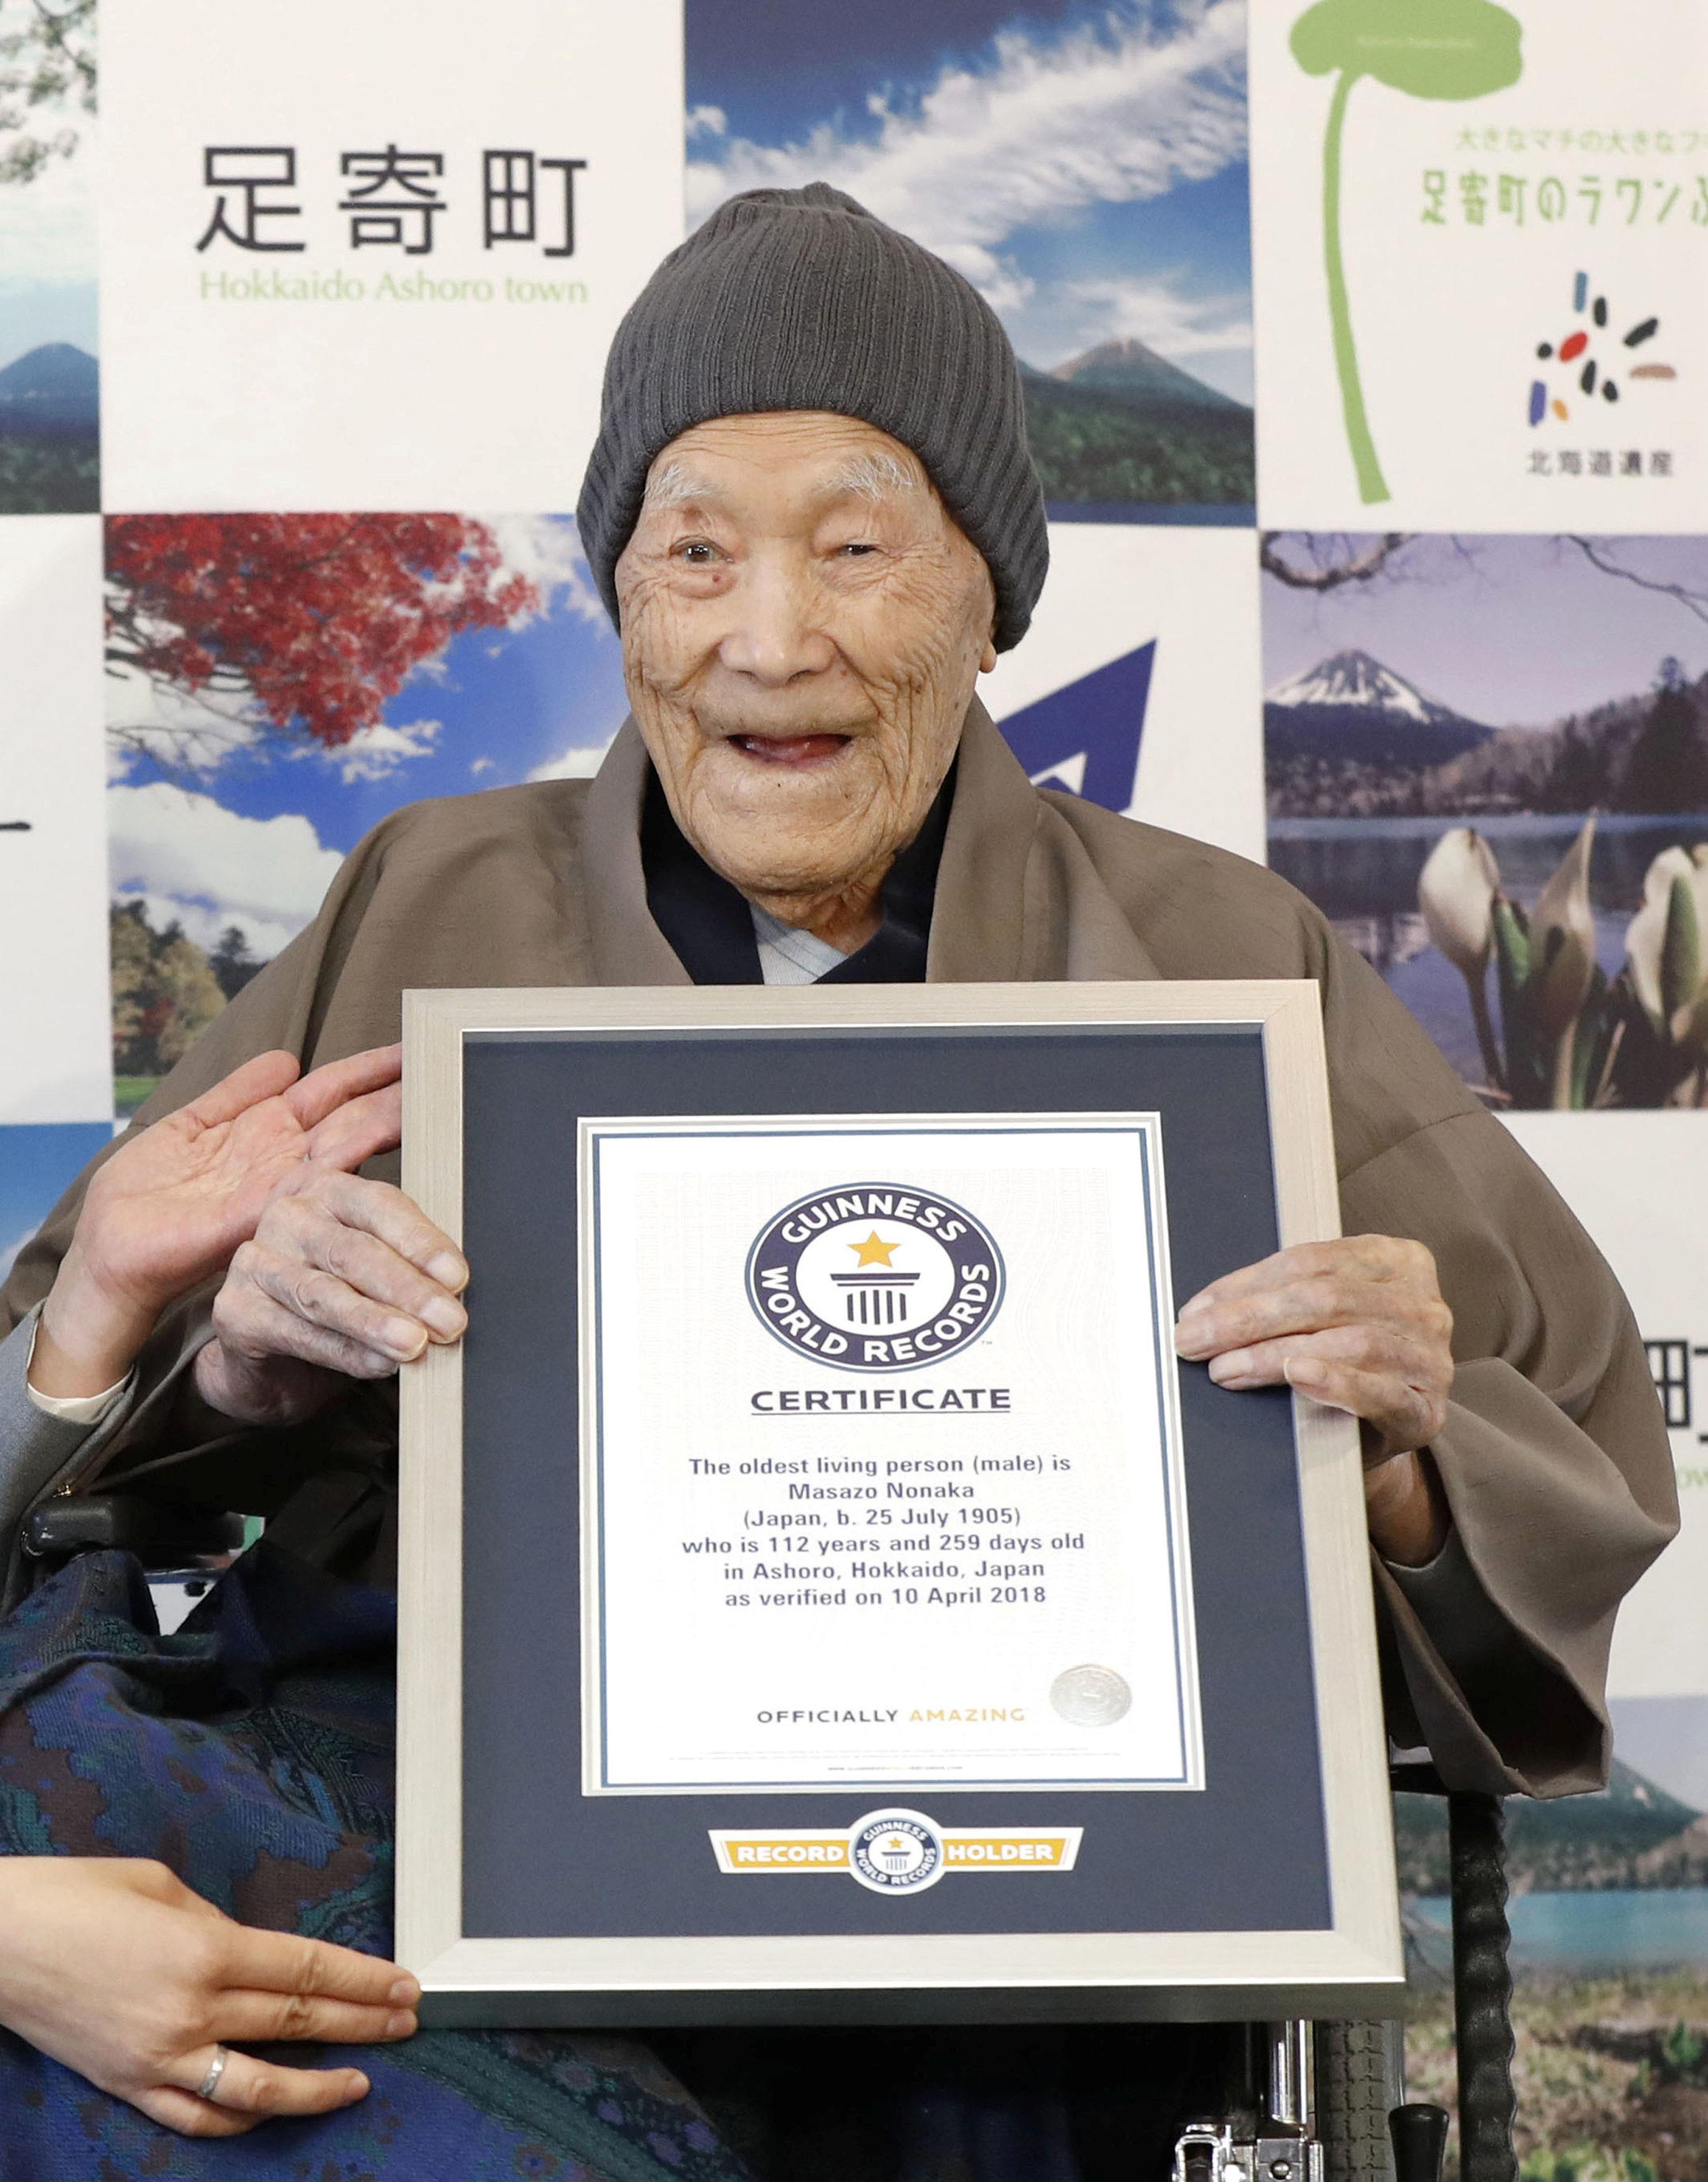 Oldest man enjoys candies, soaking in Japan's hot springs